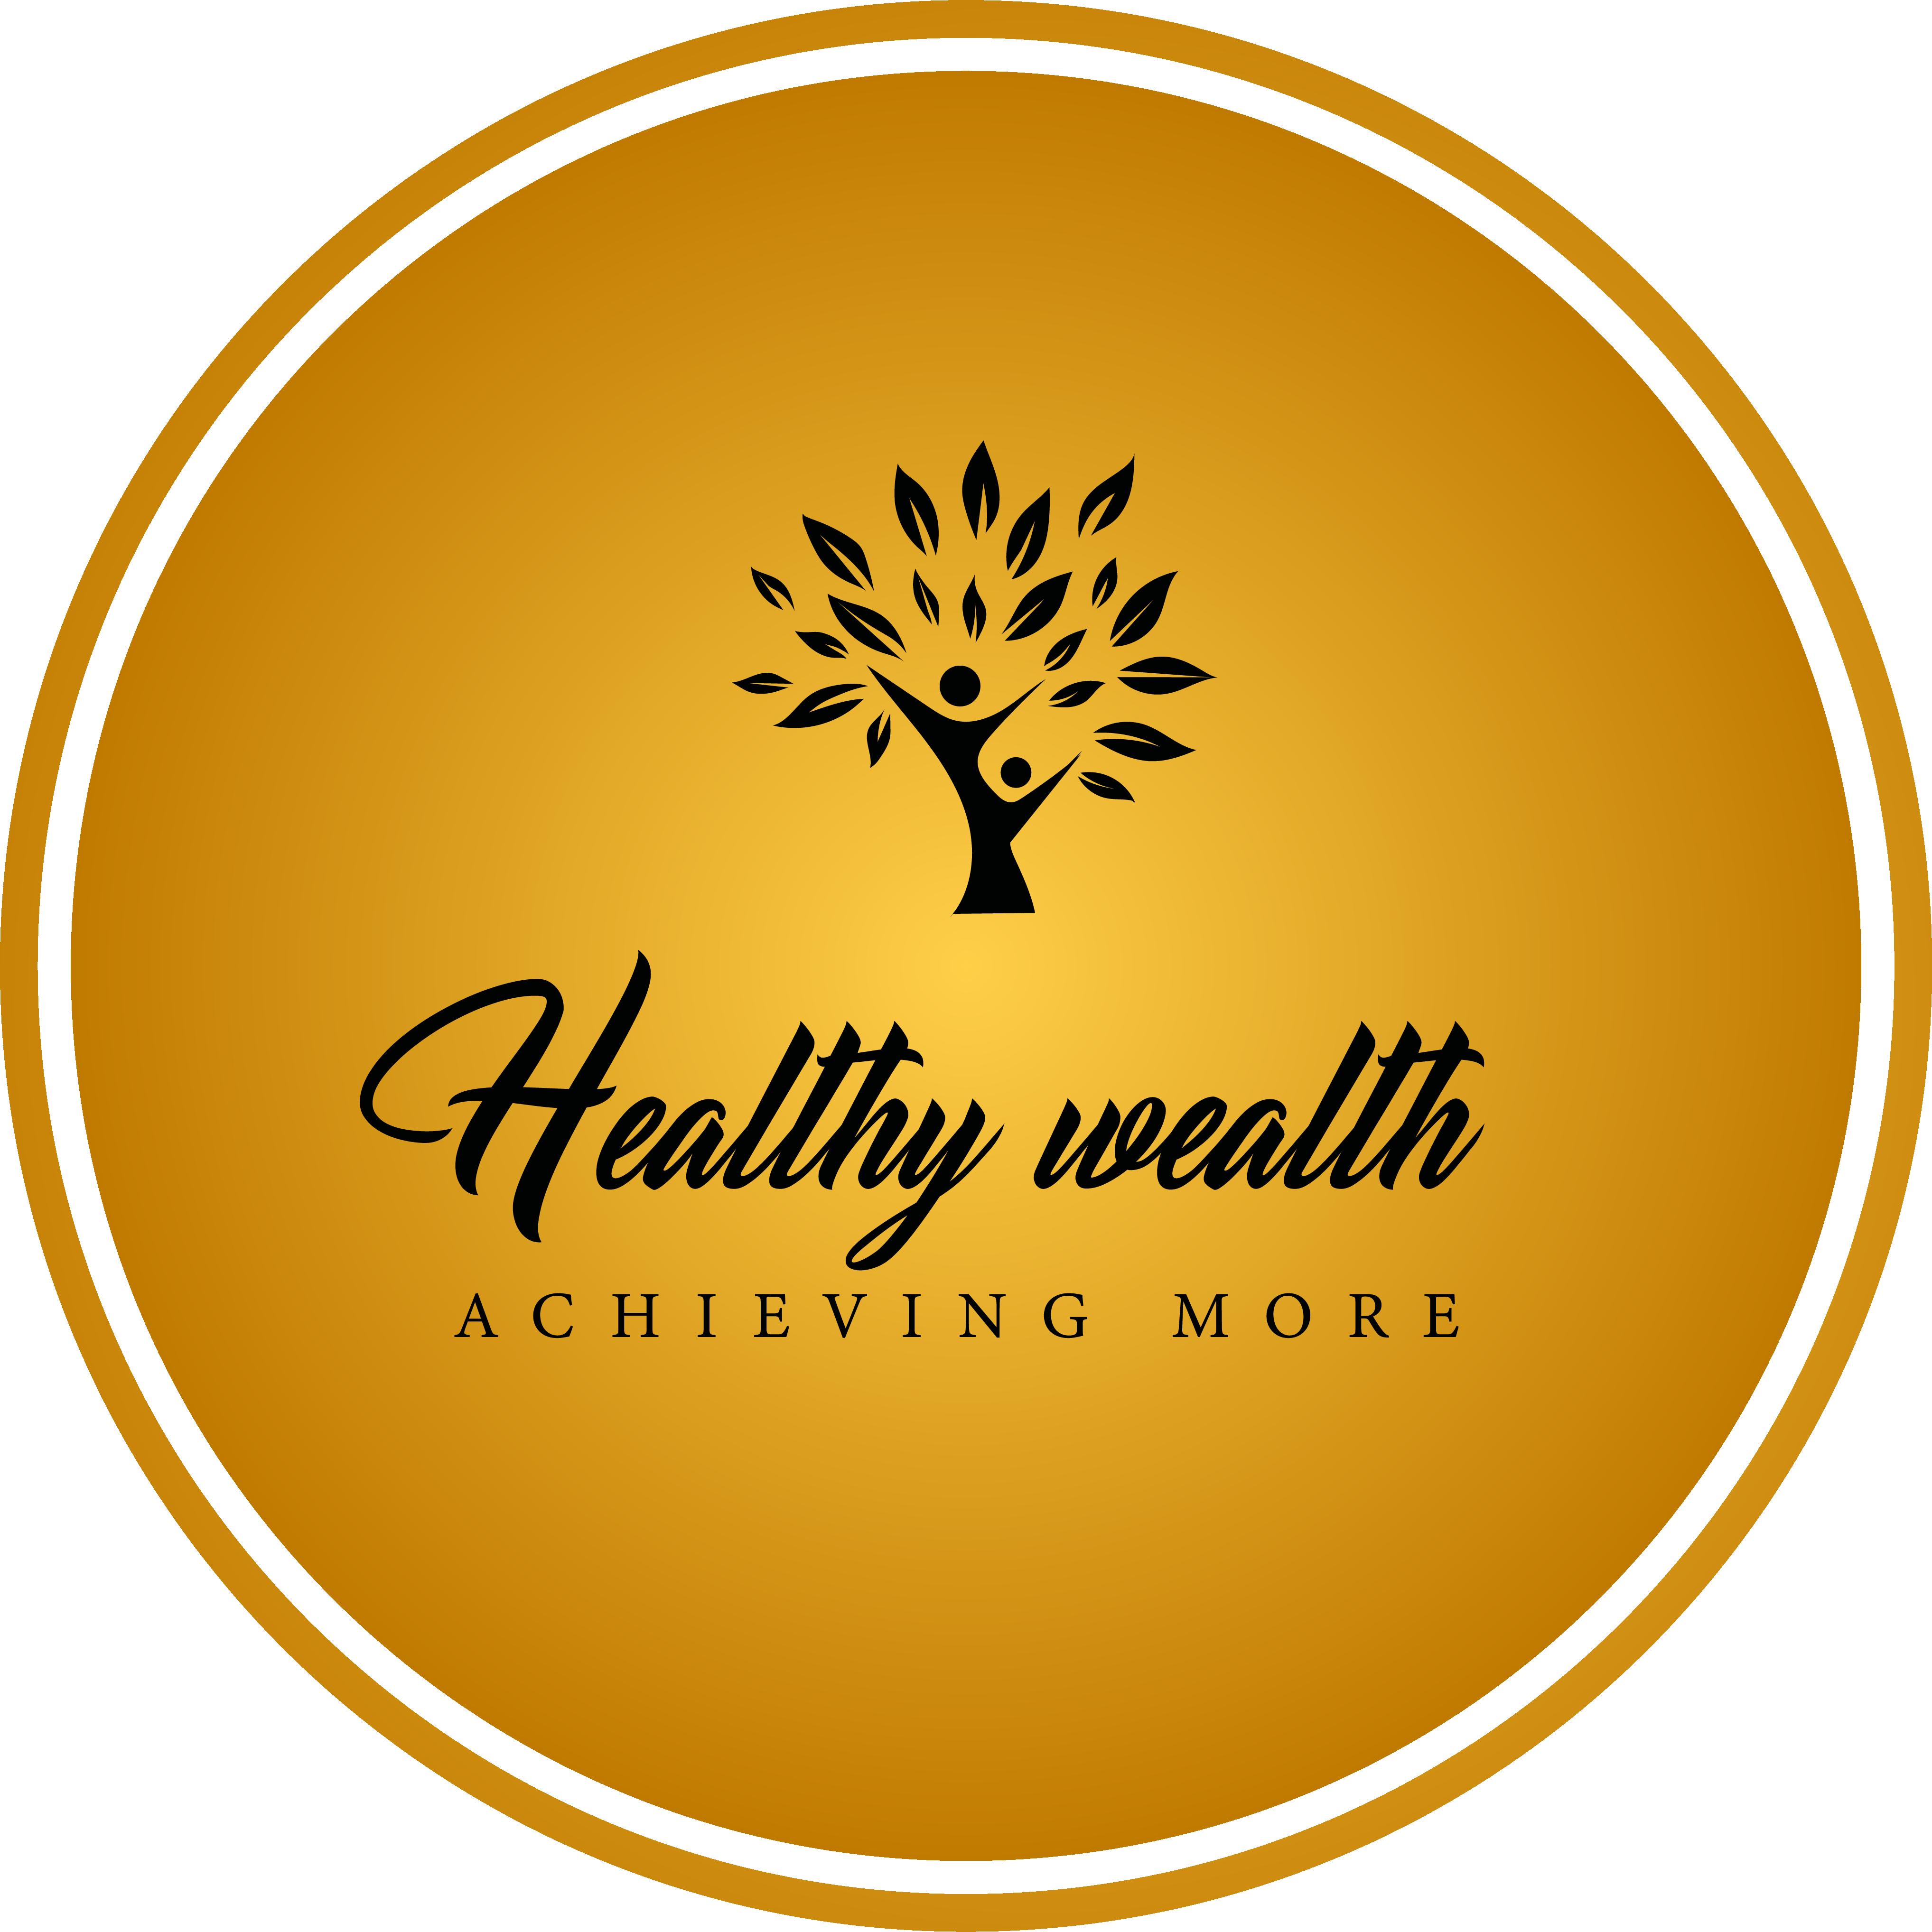 HEALTHYWEALTH